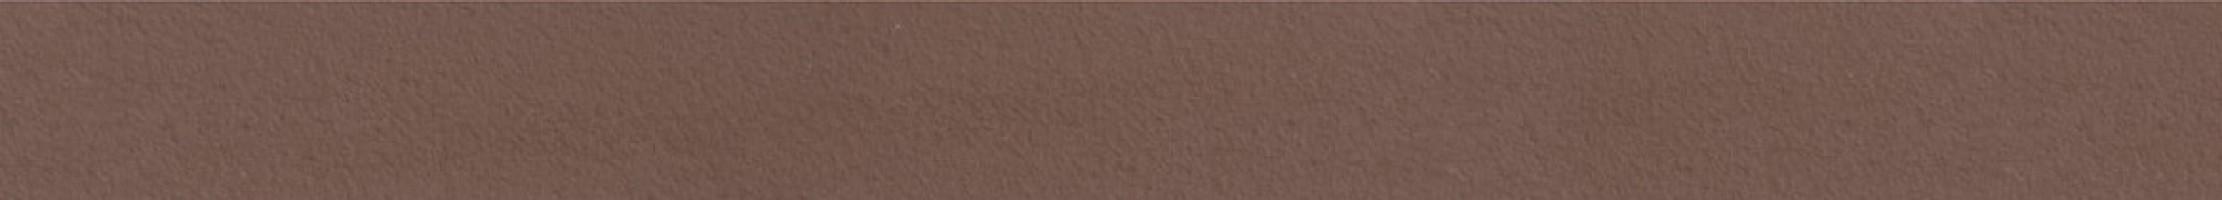 Подступенок Venatto Texture Tabica Grain Tropico 15x120